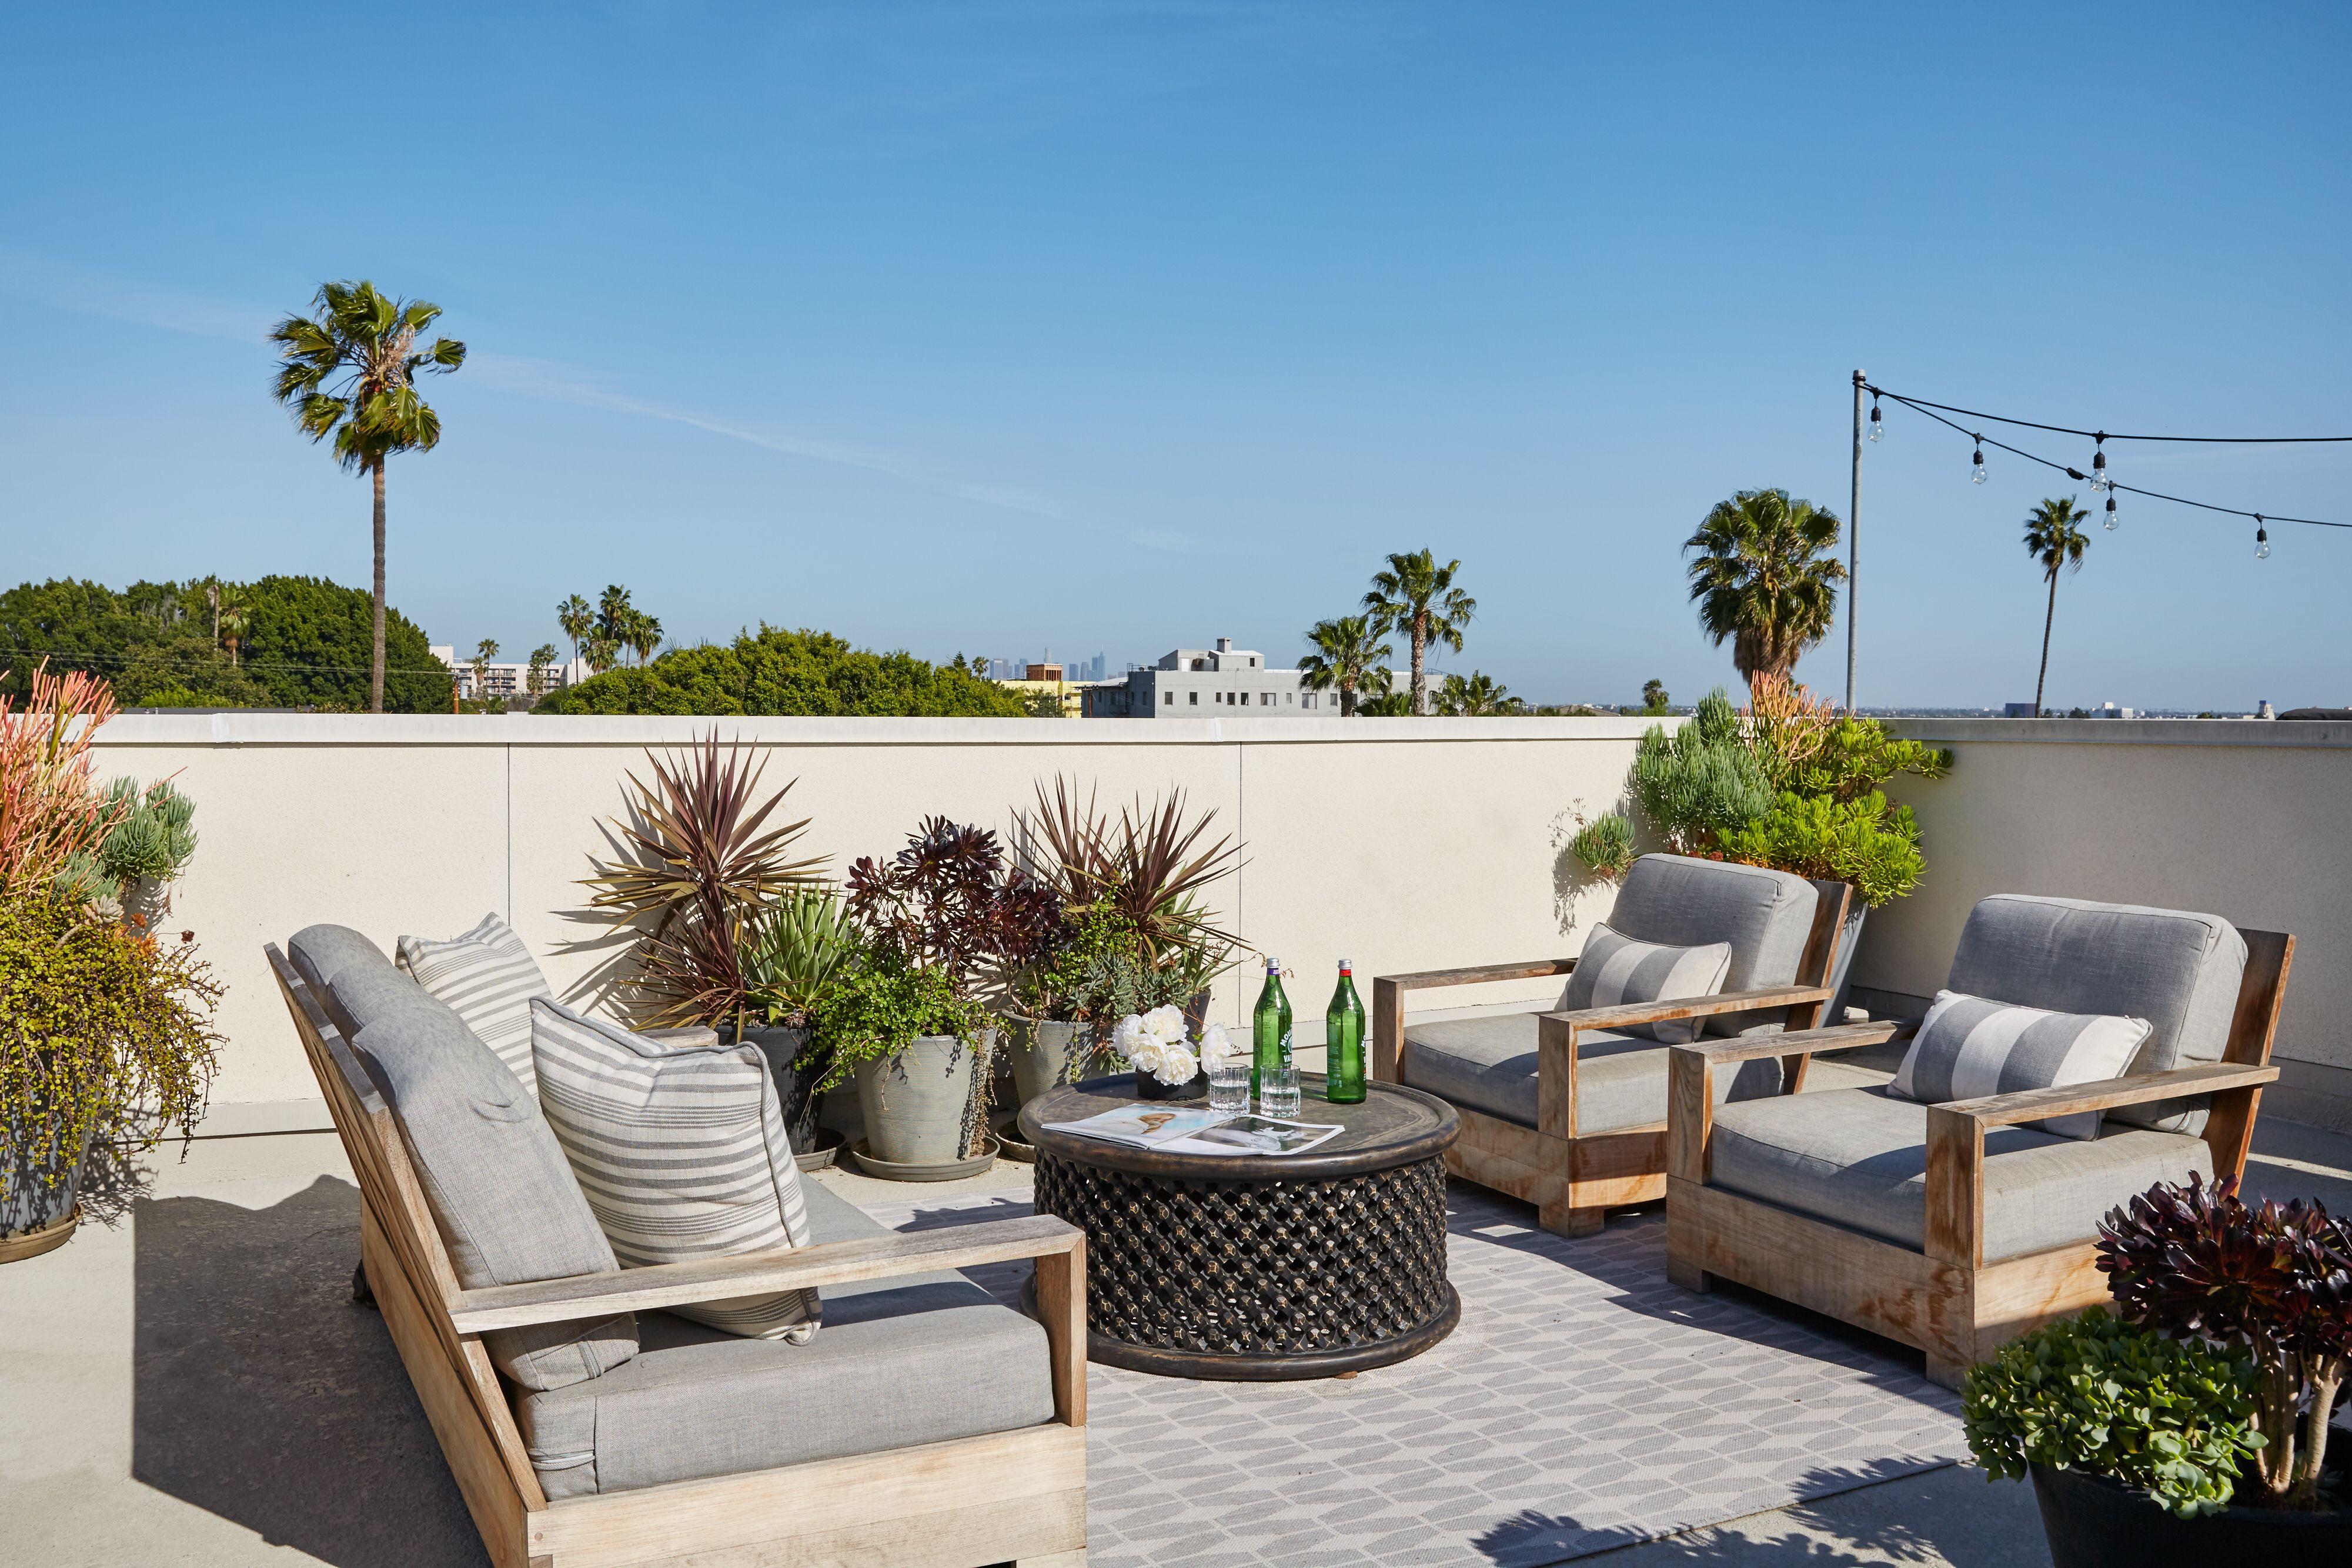 430 Outdoor Spaces Ideas Outdoor Spaces Outdoor Outdoor Living